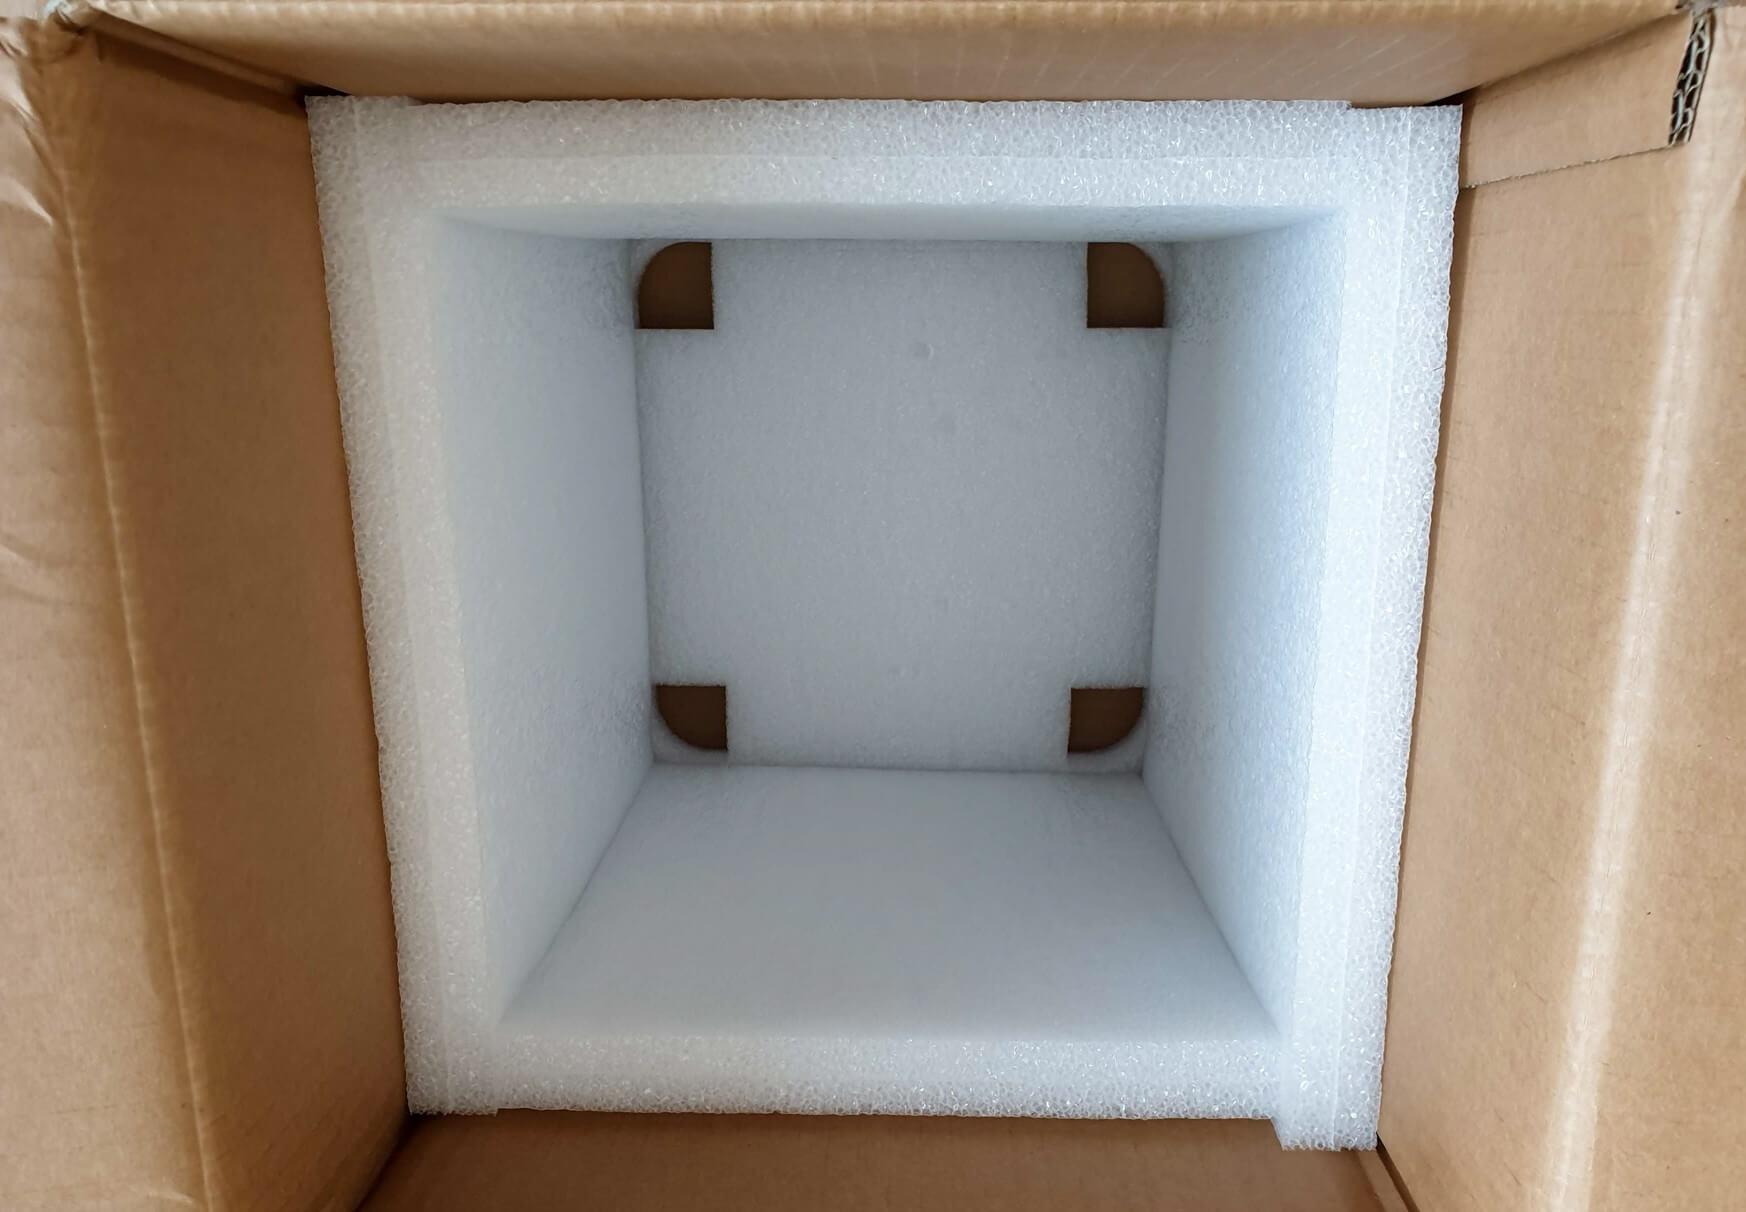 Sonic Mini review - budget resin printer